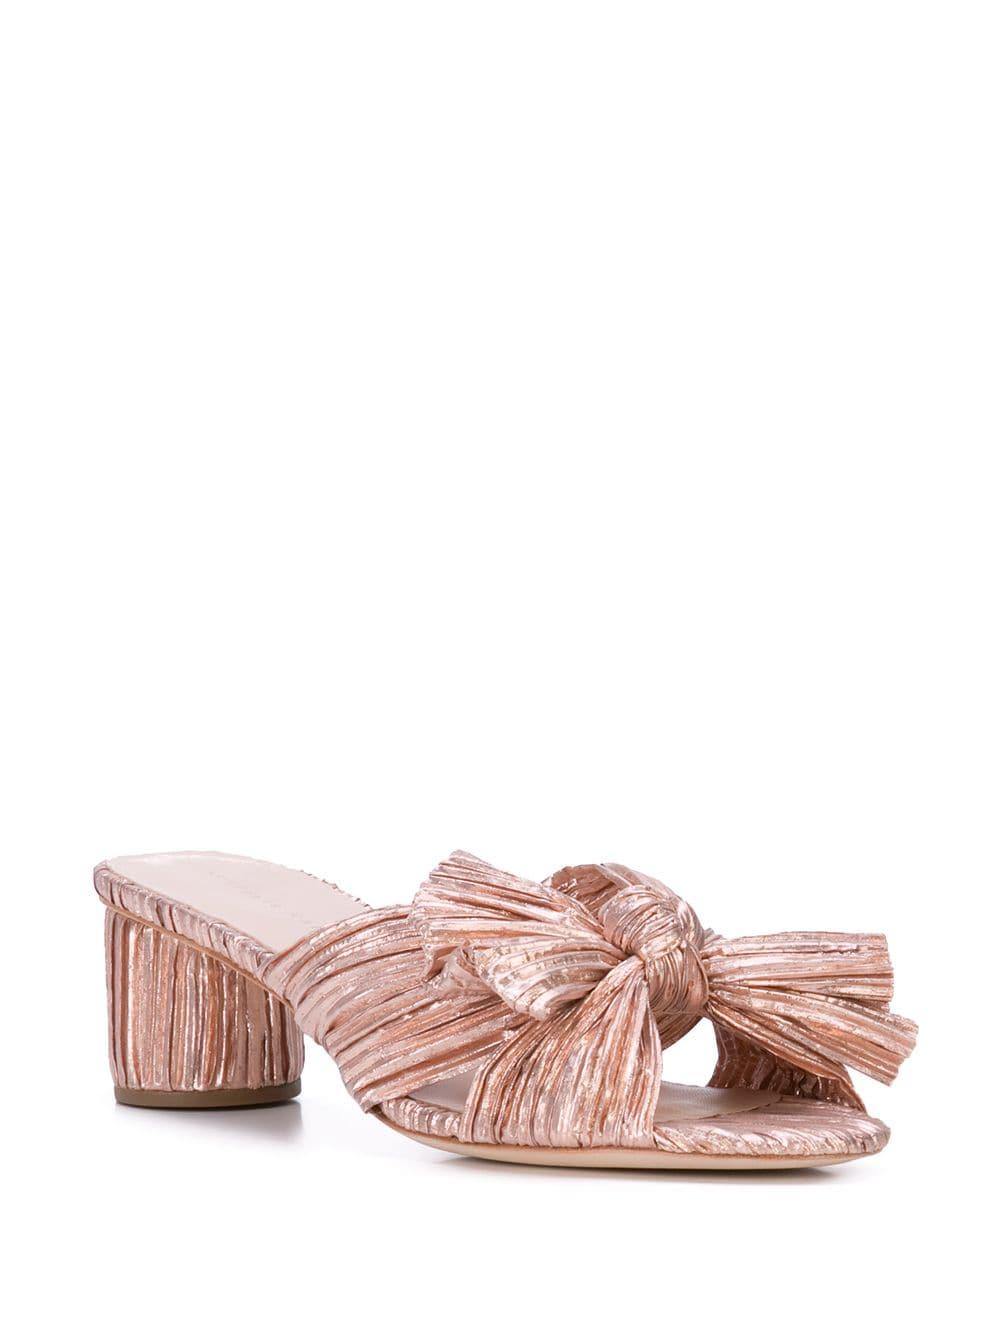 Sophie Turner Loeffler Randall Wedding Shoes Restock